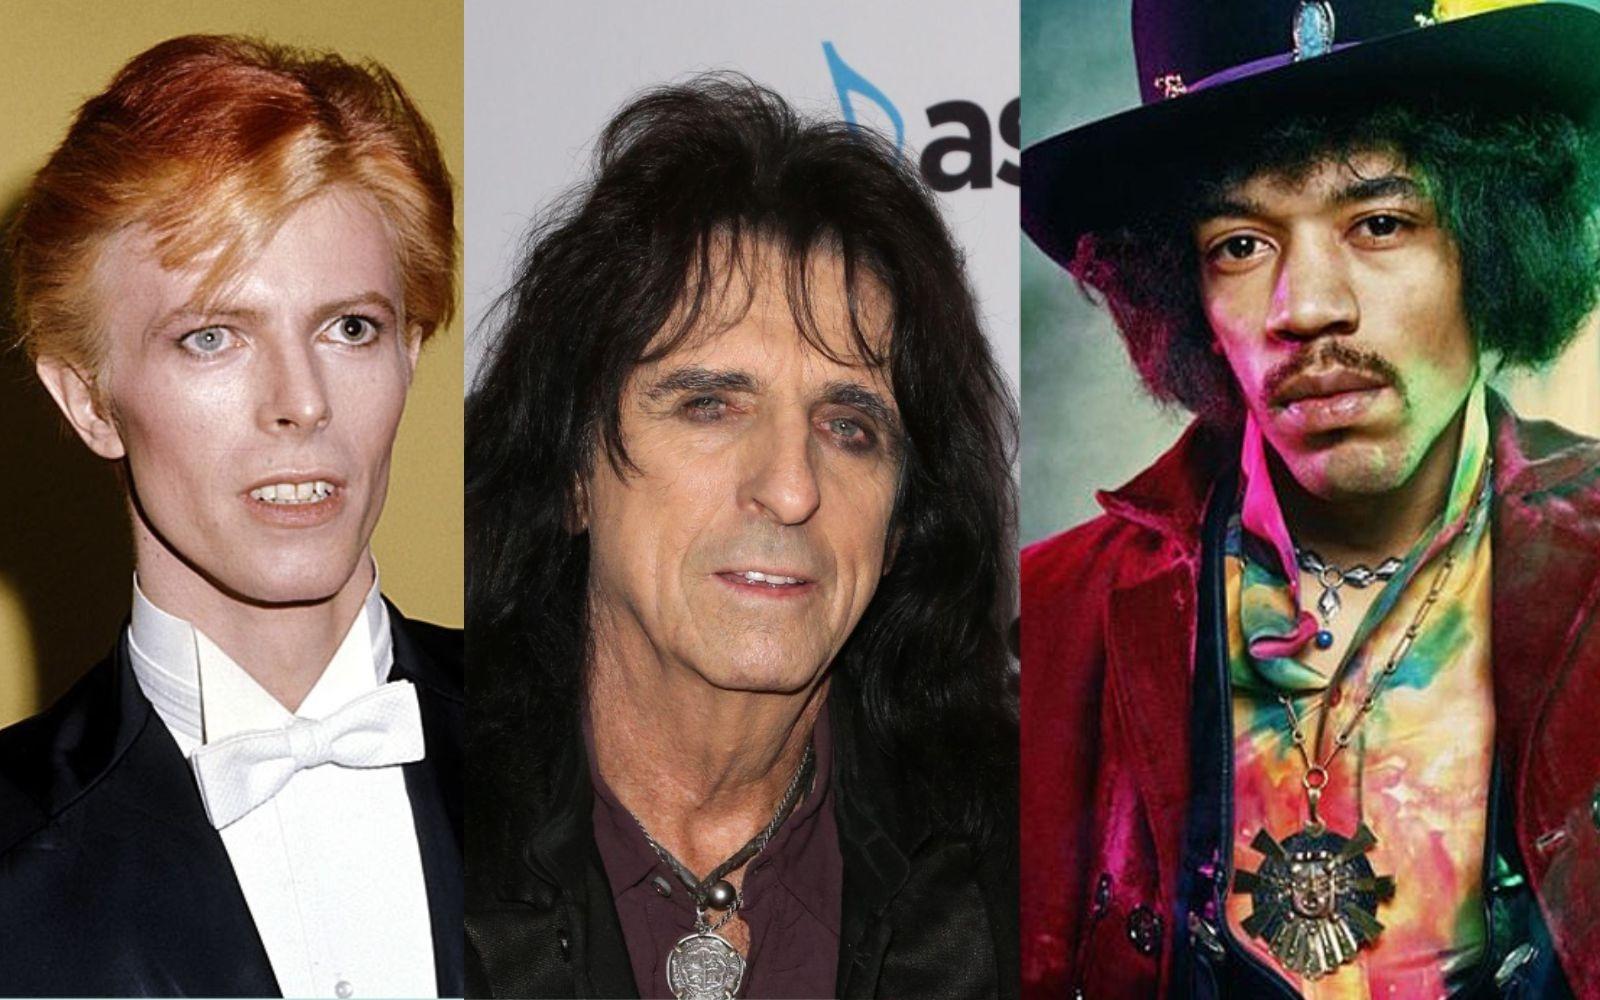 David Bowie Alice Cooper Jimi Hendrix